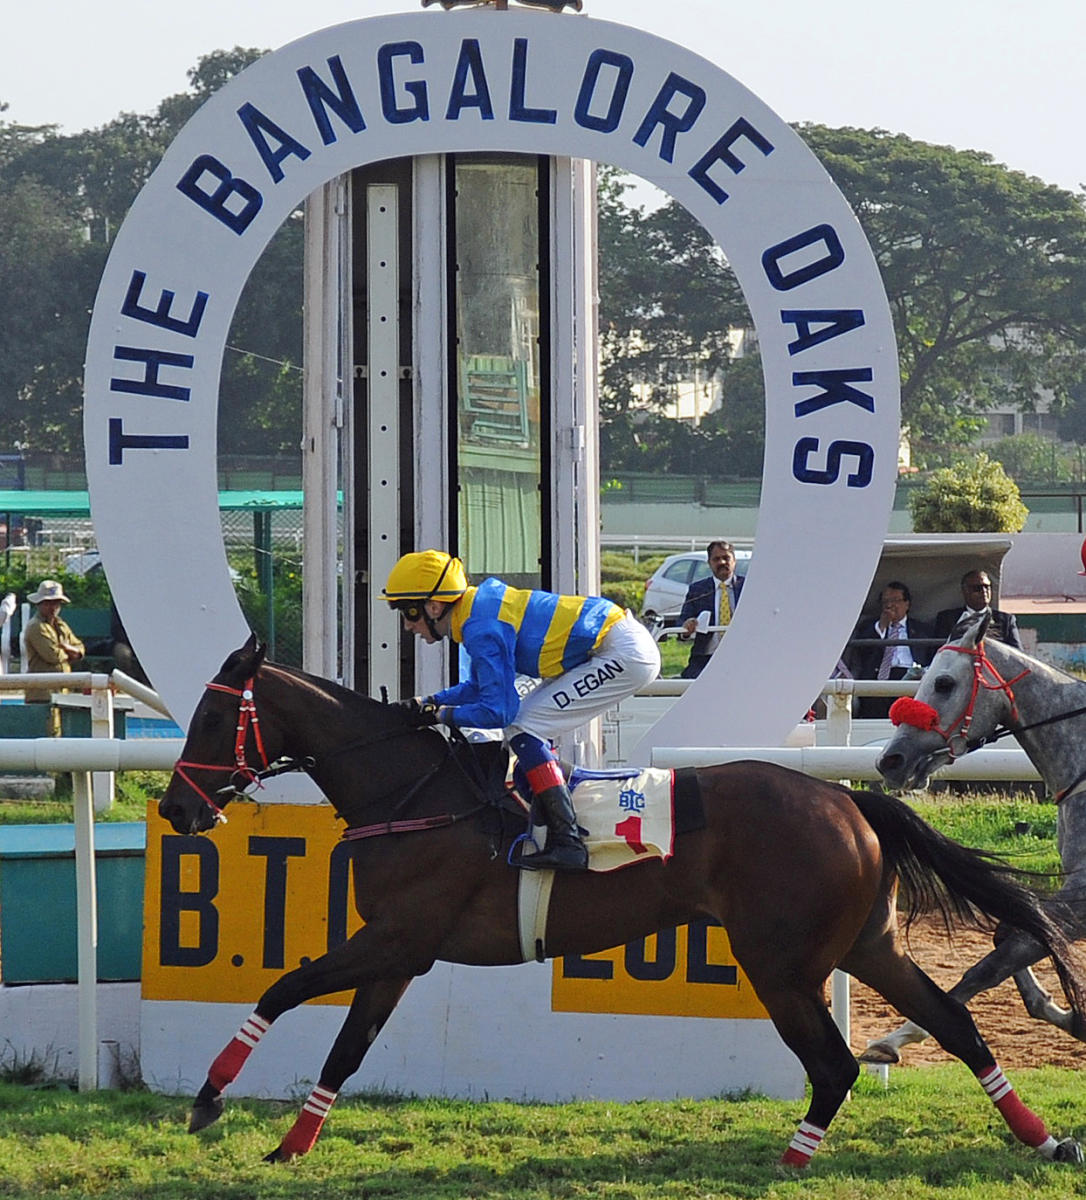 Bangalore turf club off course betting centre euromillions bettingadvice